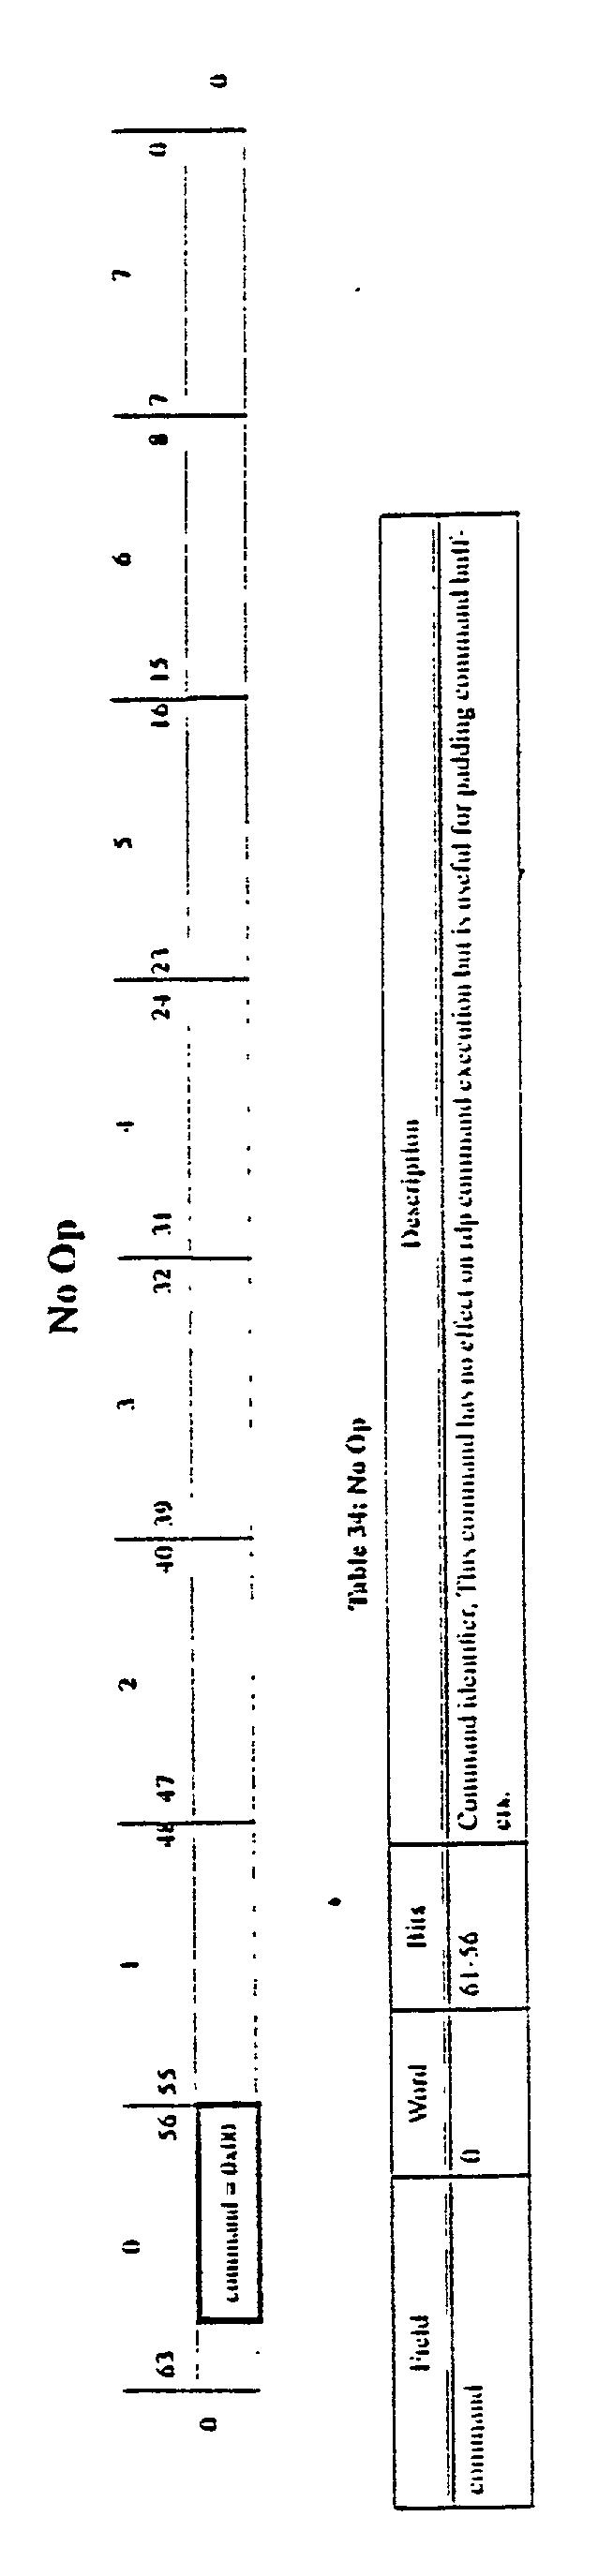 Figure US20030080963A1-20030501-P00046